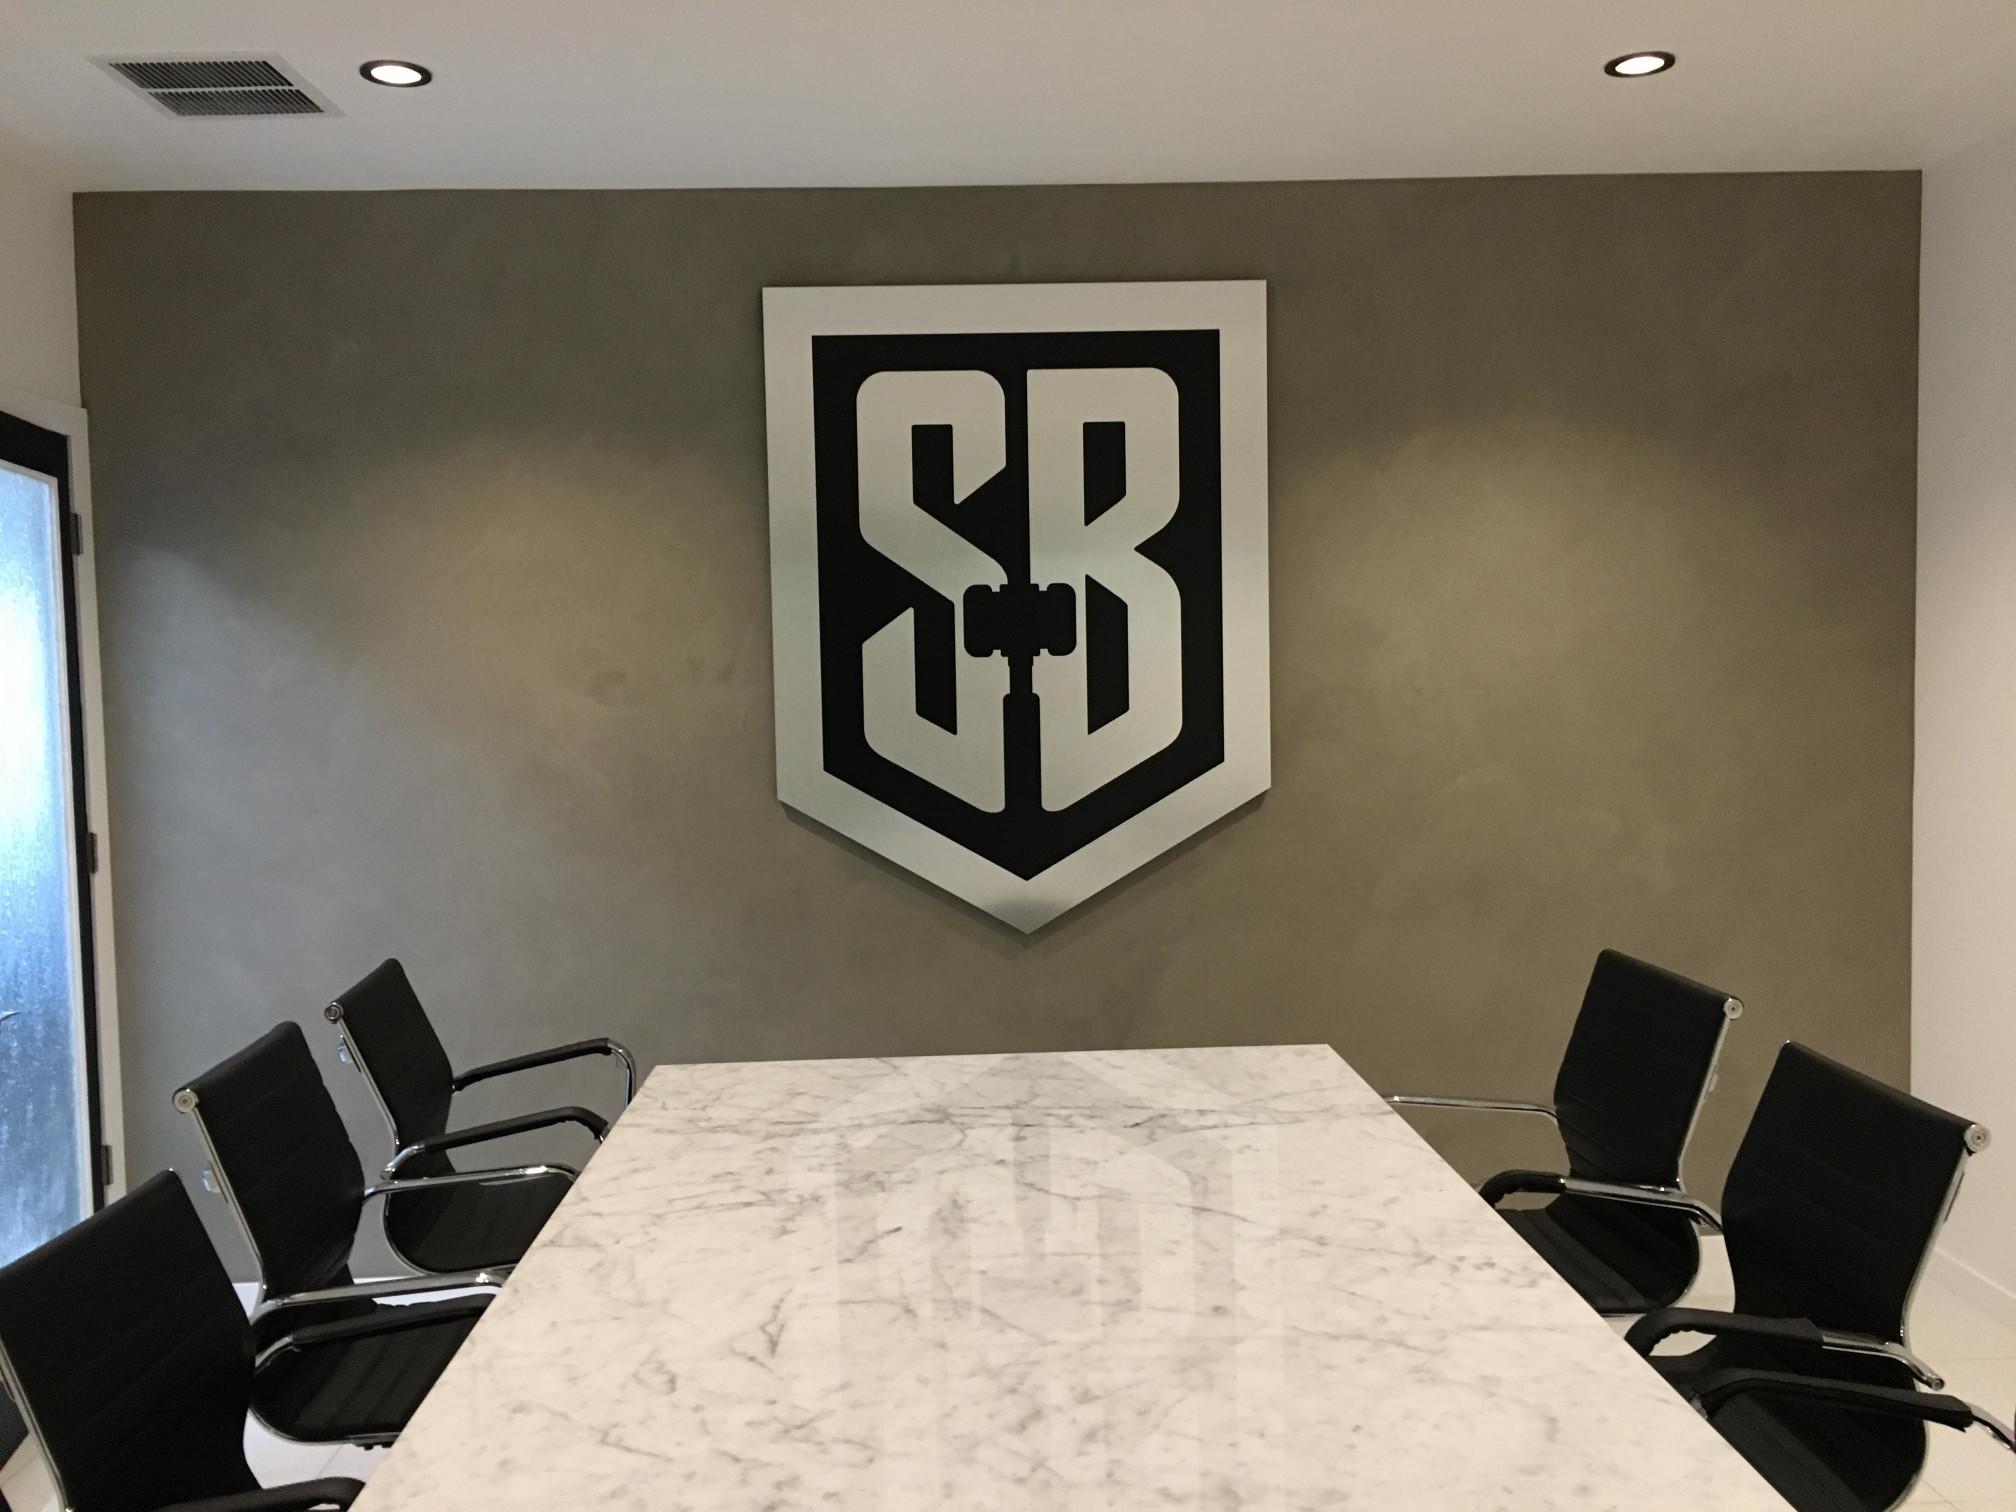 Conference Room 3D Logo